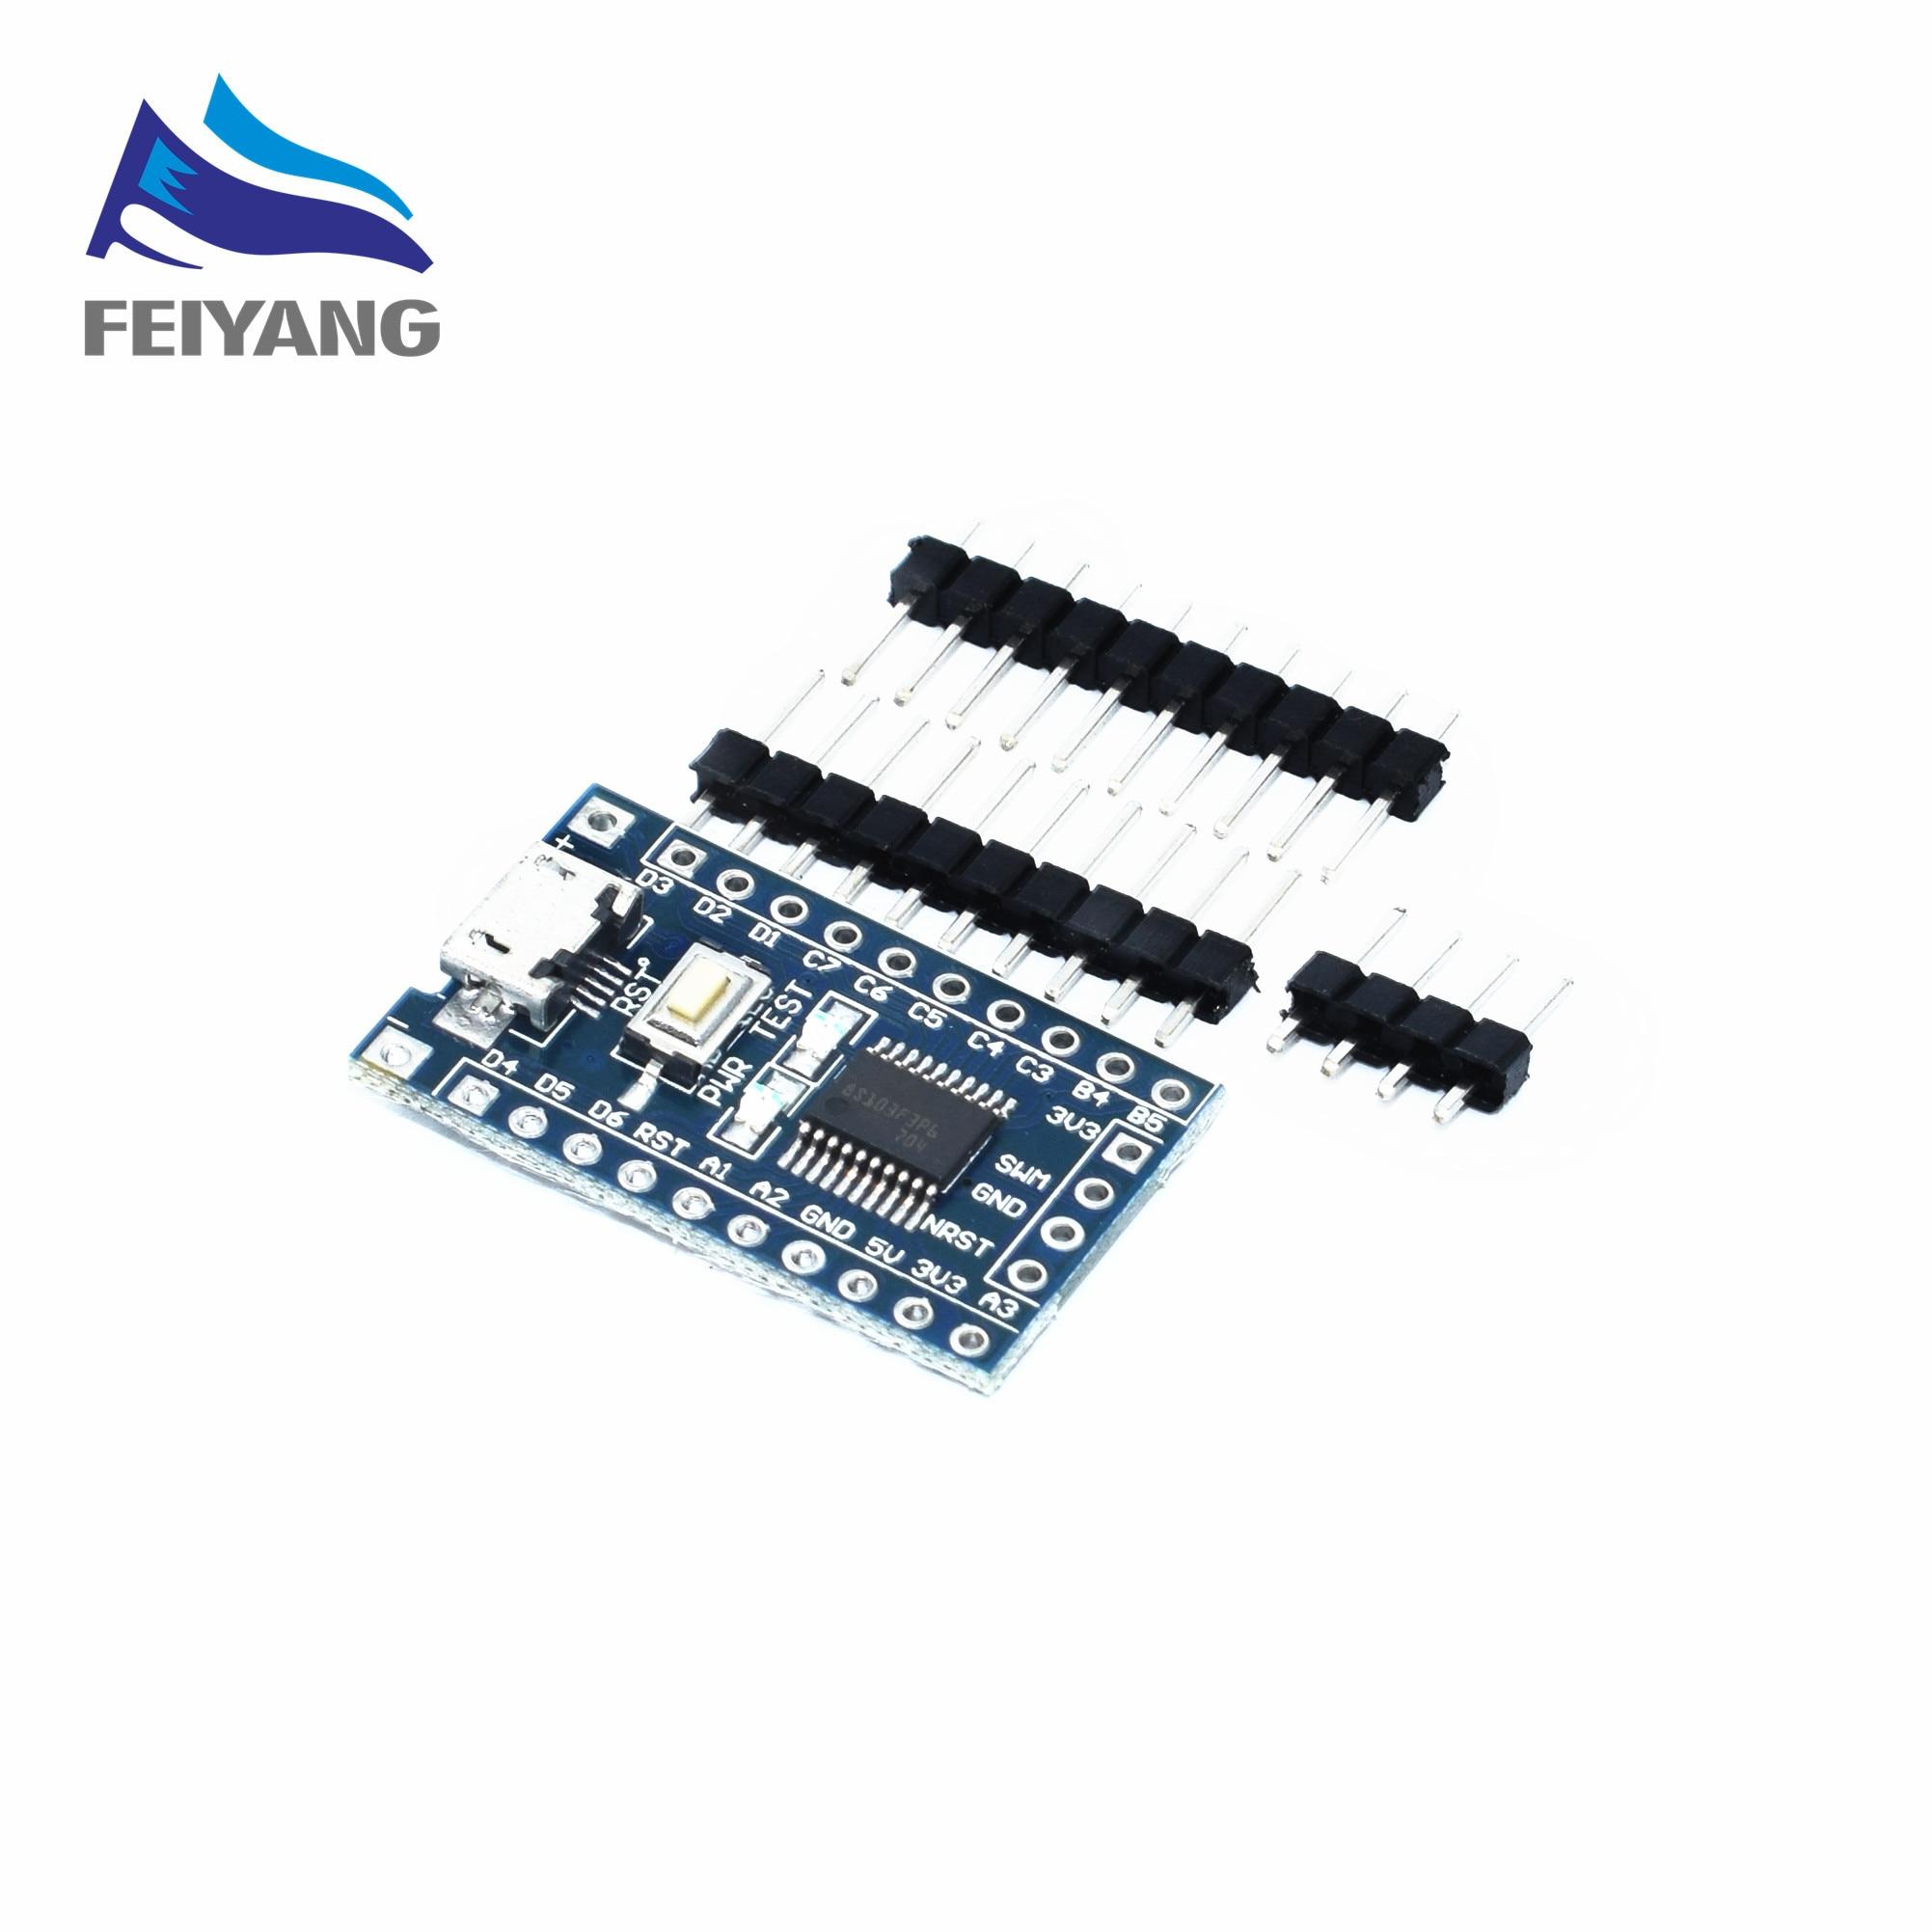 A35 1pcs/lot STM8S103F3P6 system board STM8S STM8 development board minimum core board 1